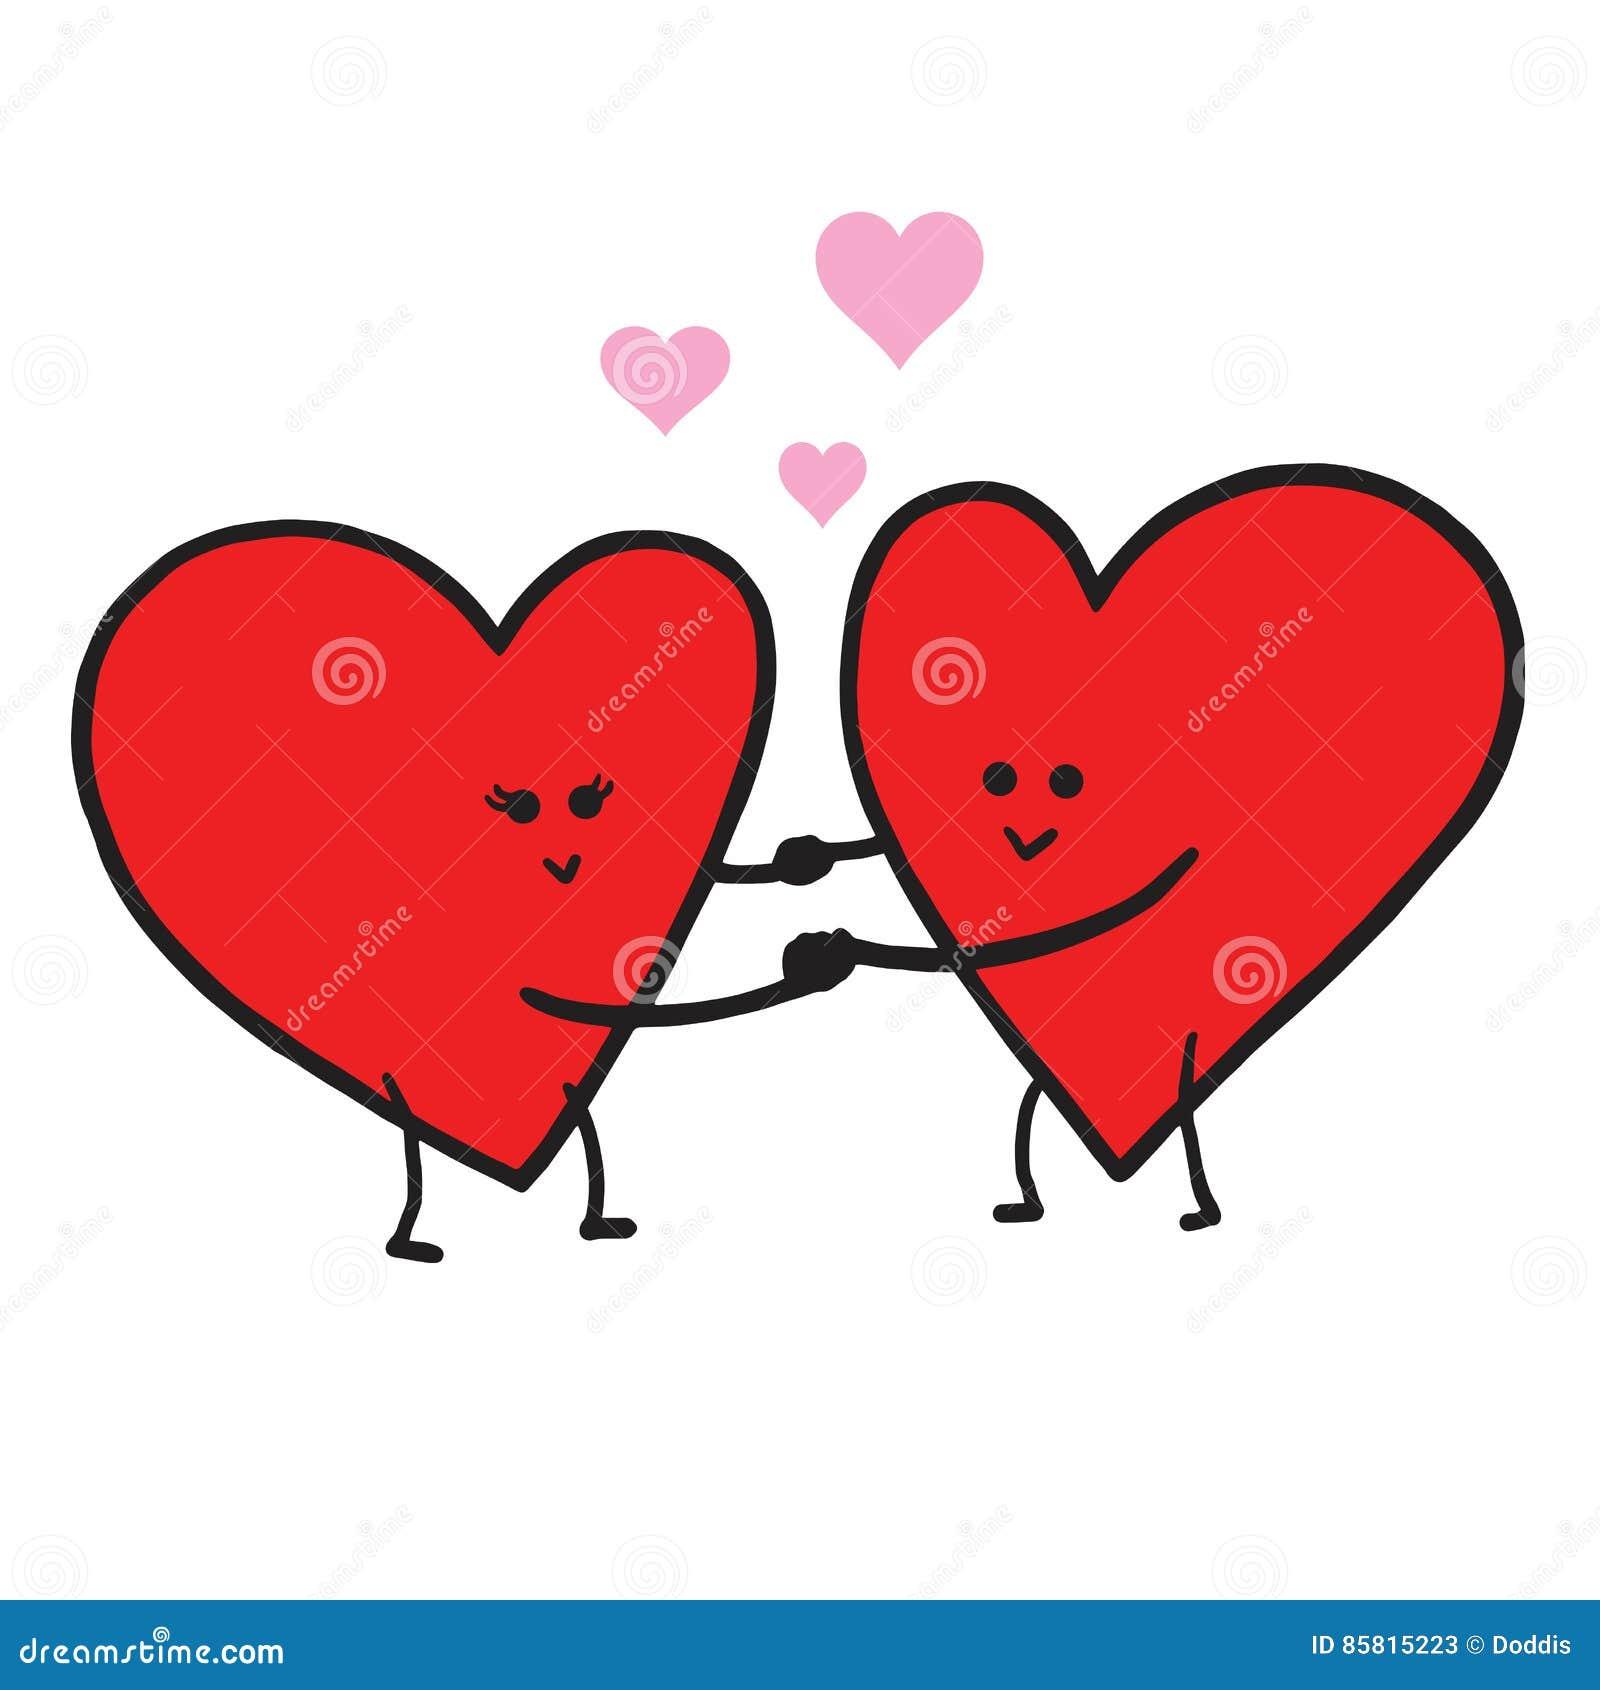 Cute Love Cartoon In Love Vector Illustration. Valentine ...